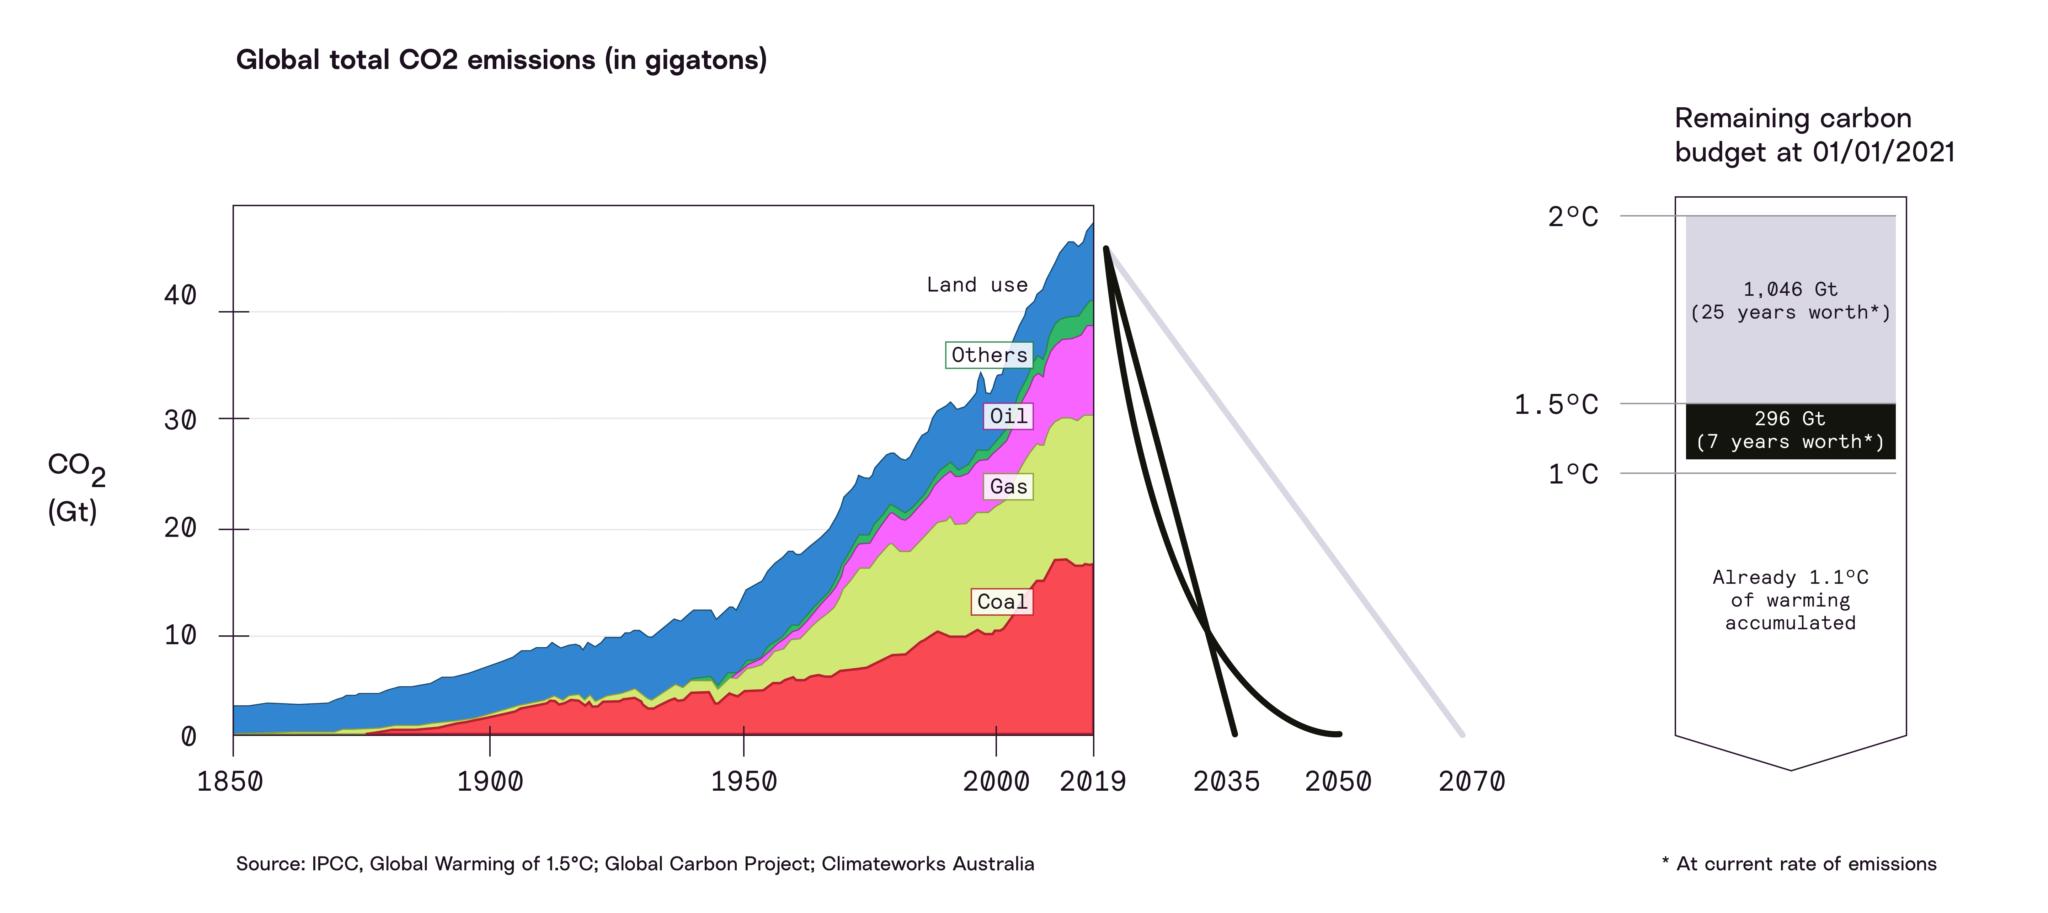 Carbon budget chart